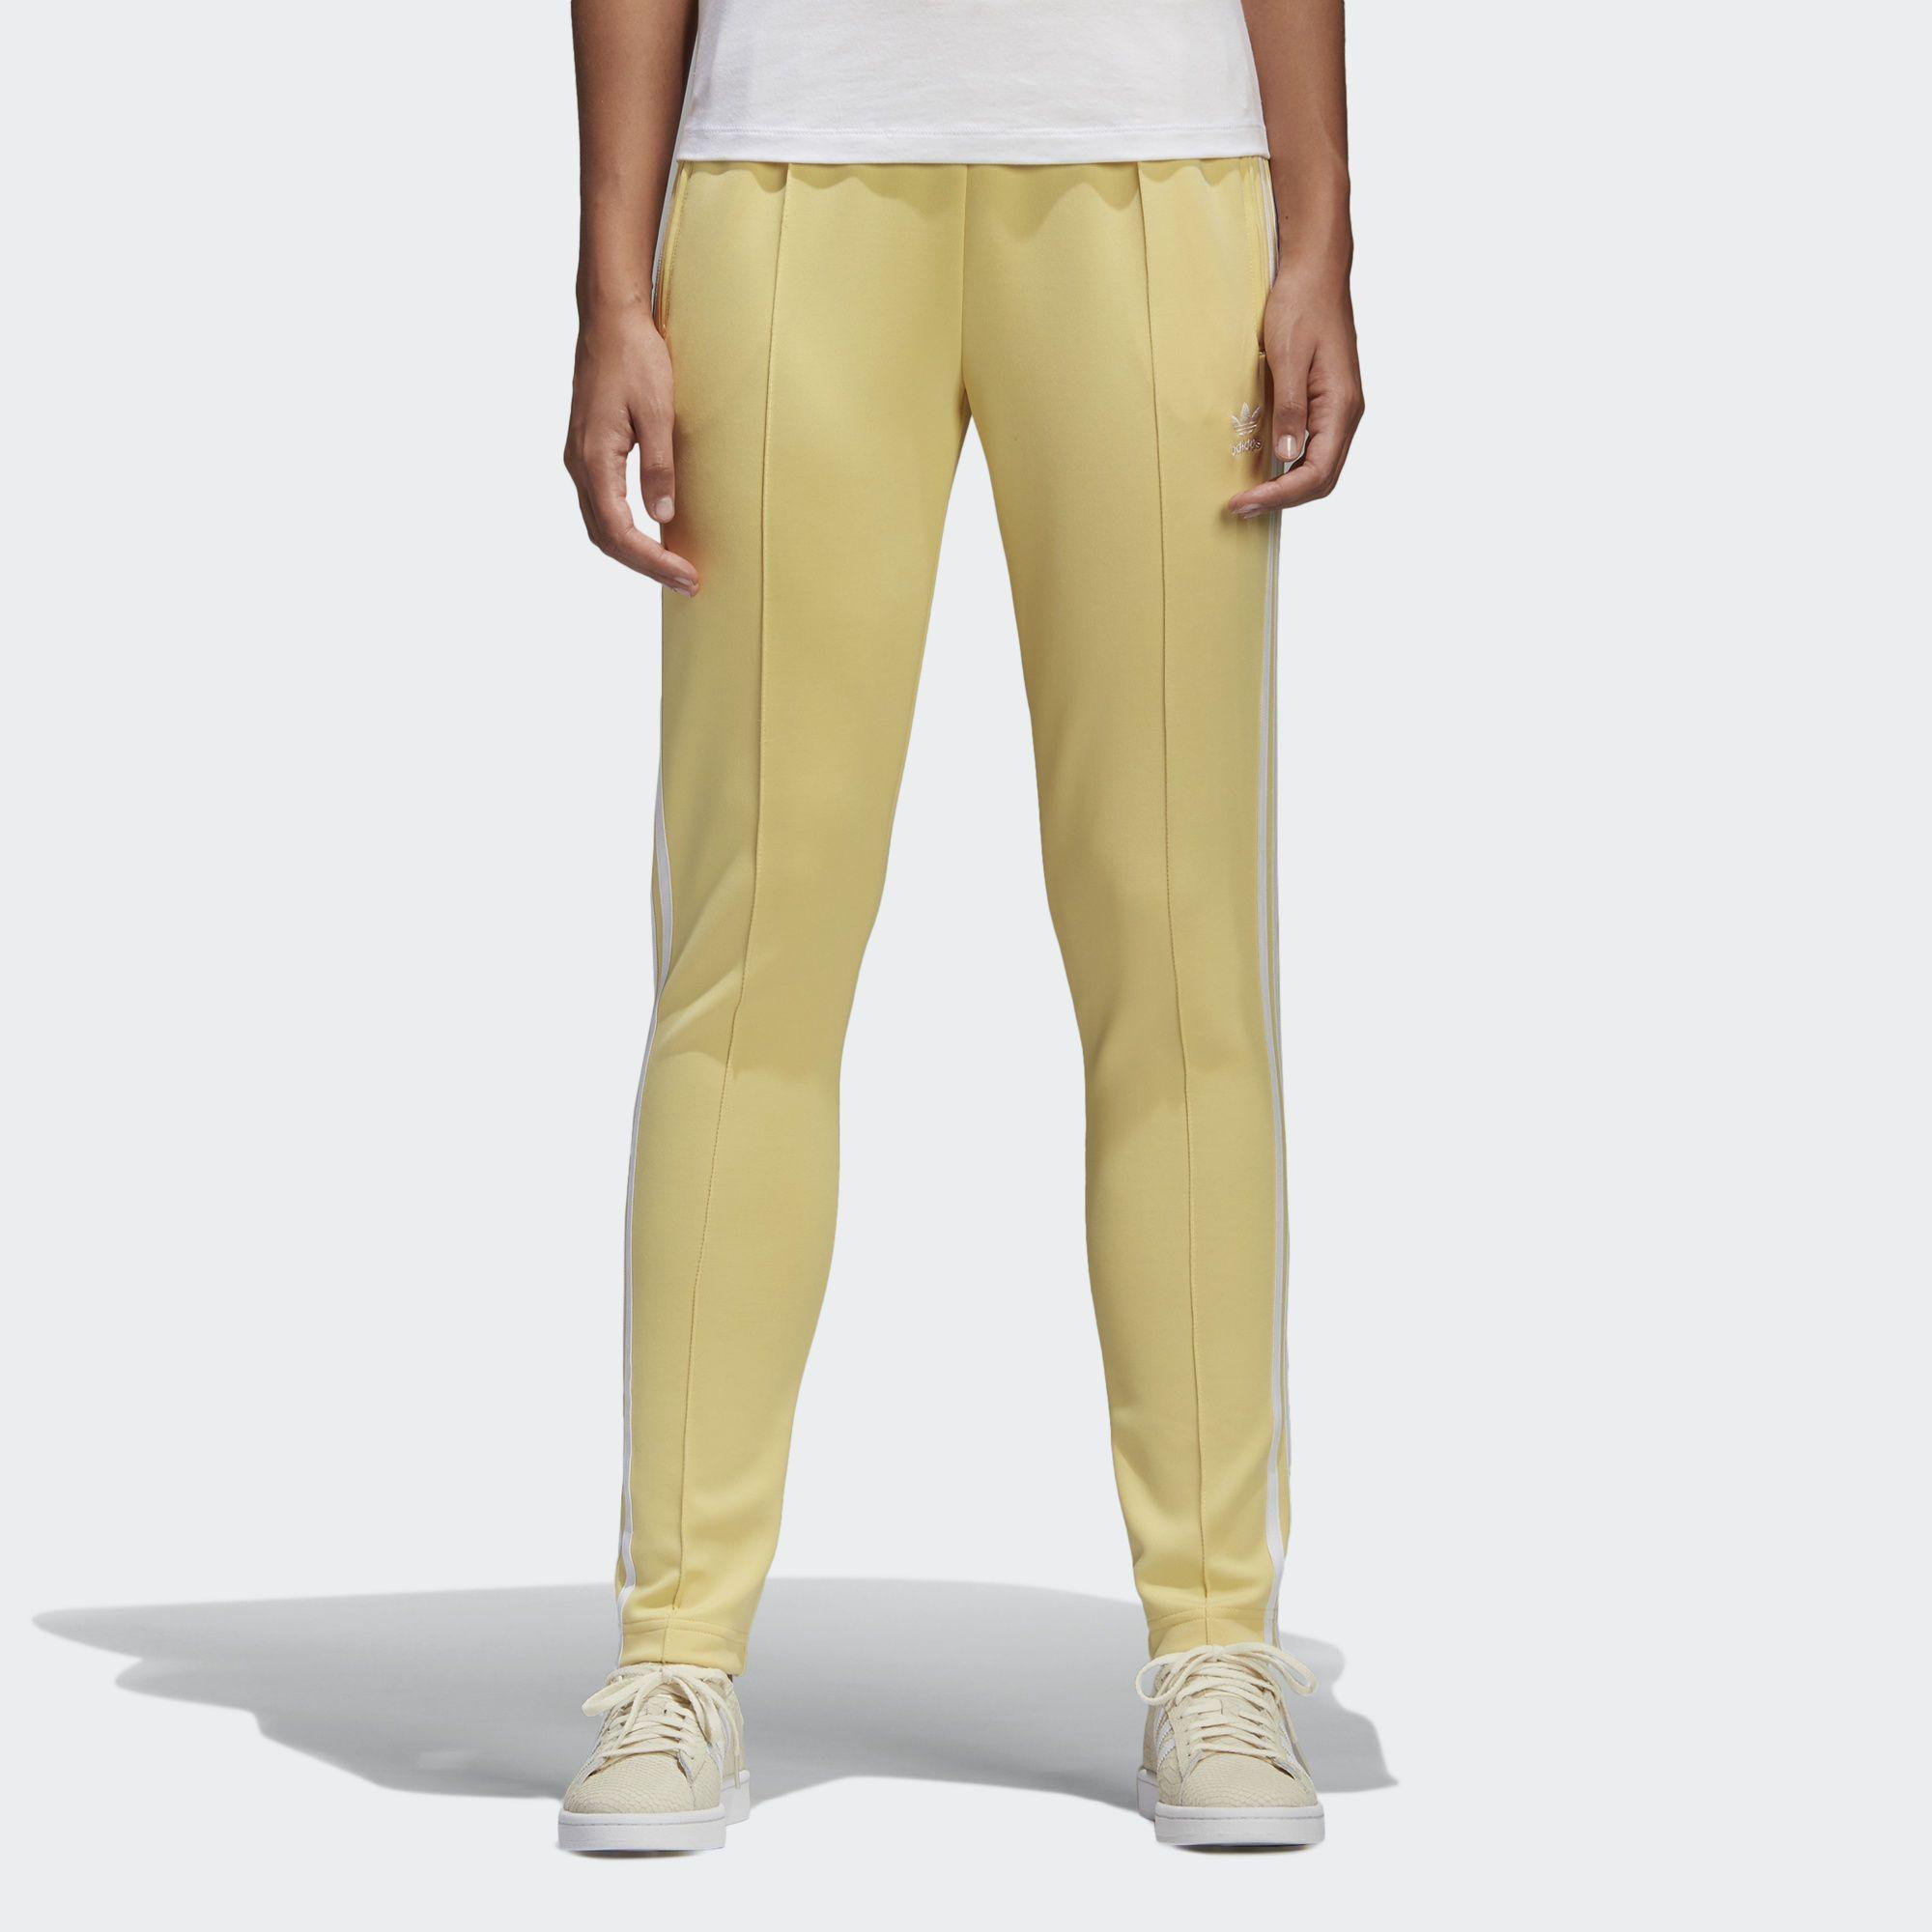 SST TP - Beige $65 | Track pants women, Pants, Jogging leggings